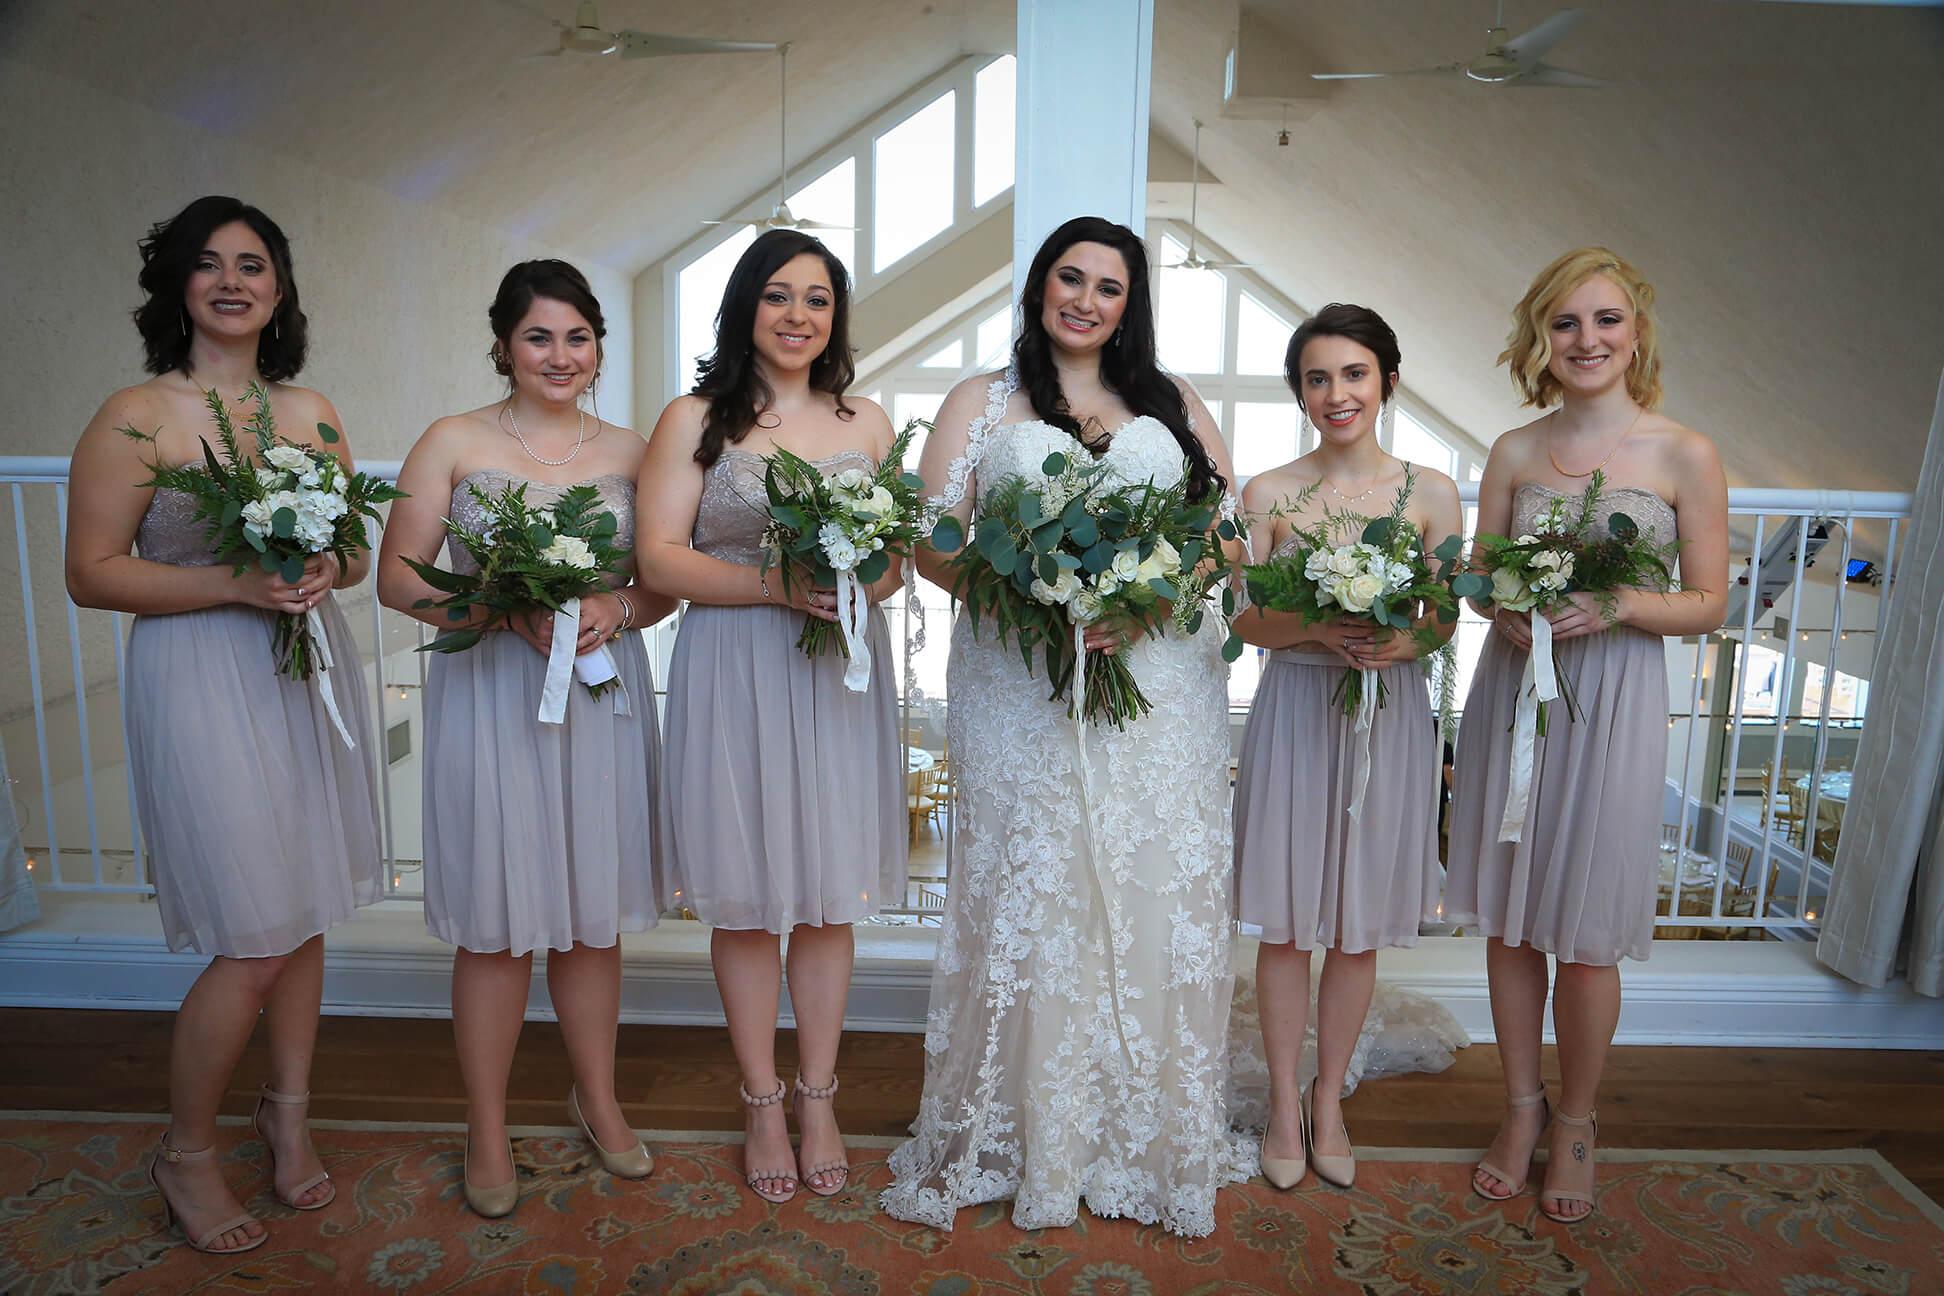 Melissa-+-Ken---Celebrations-at-the-Bay---https-www.whysallphotography.comblogcelebrations-at-the-bay-wedding22.jpeg